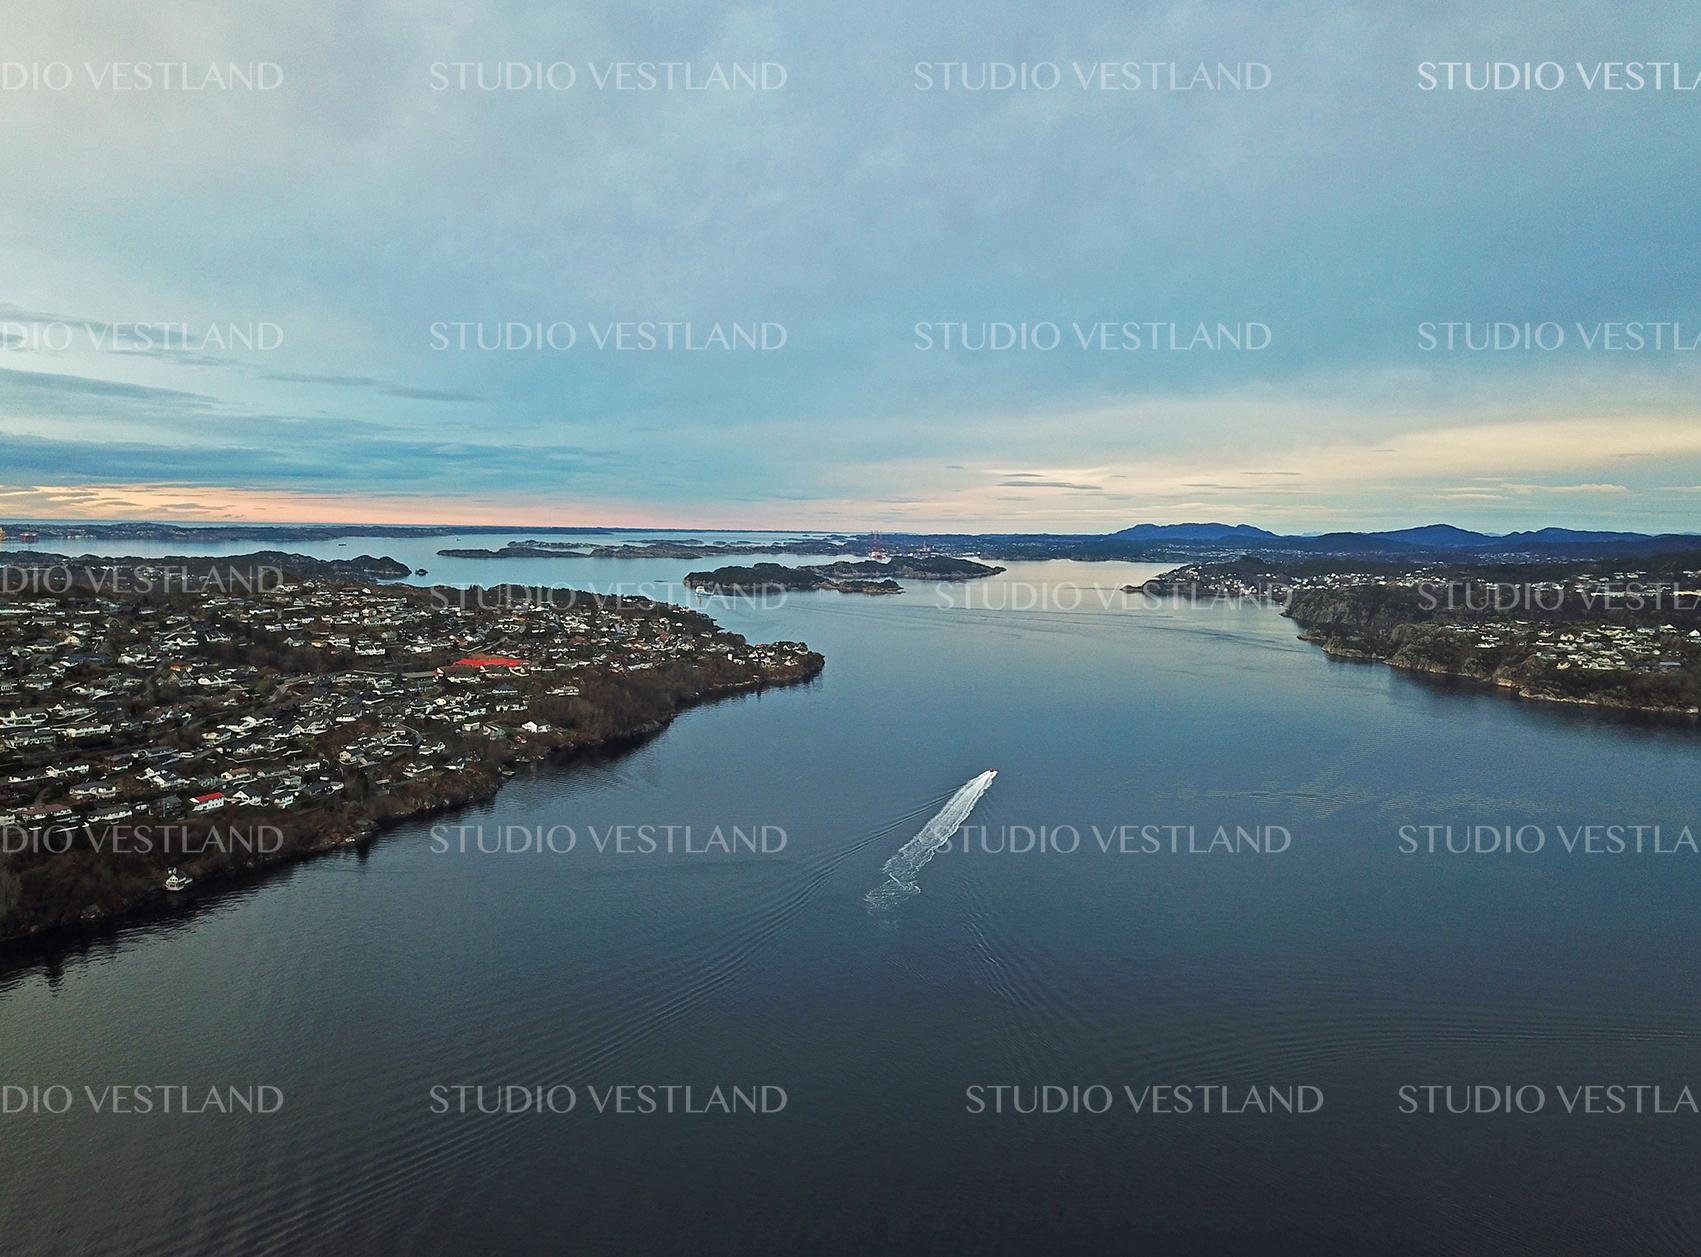 Studio Vestland - Sotra 02